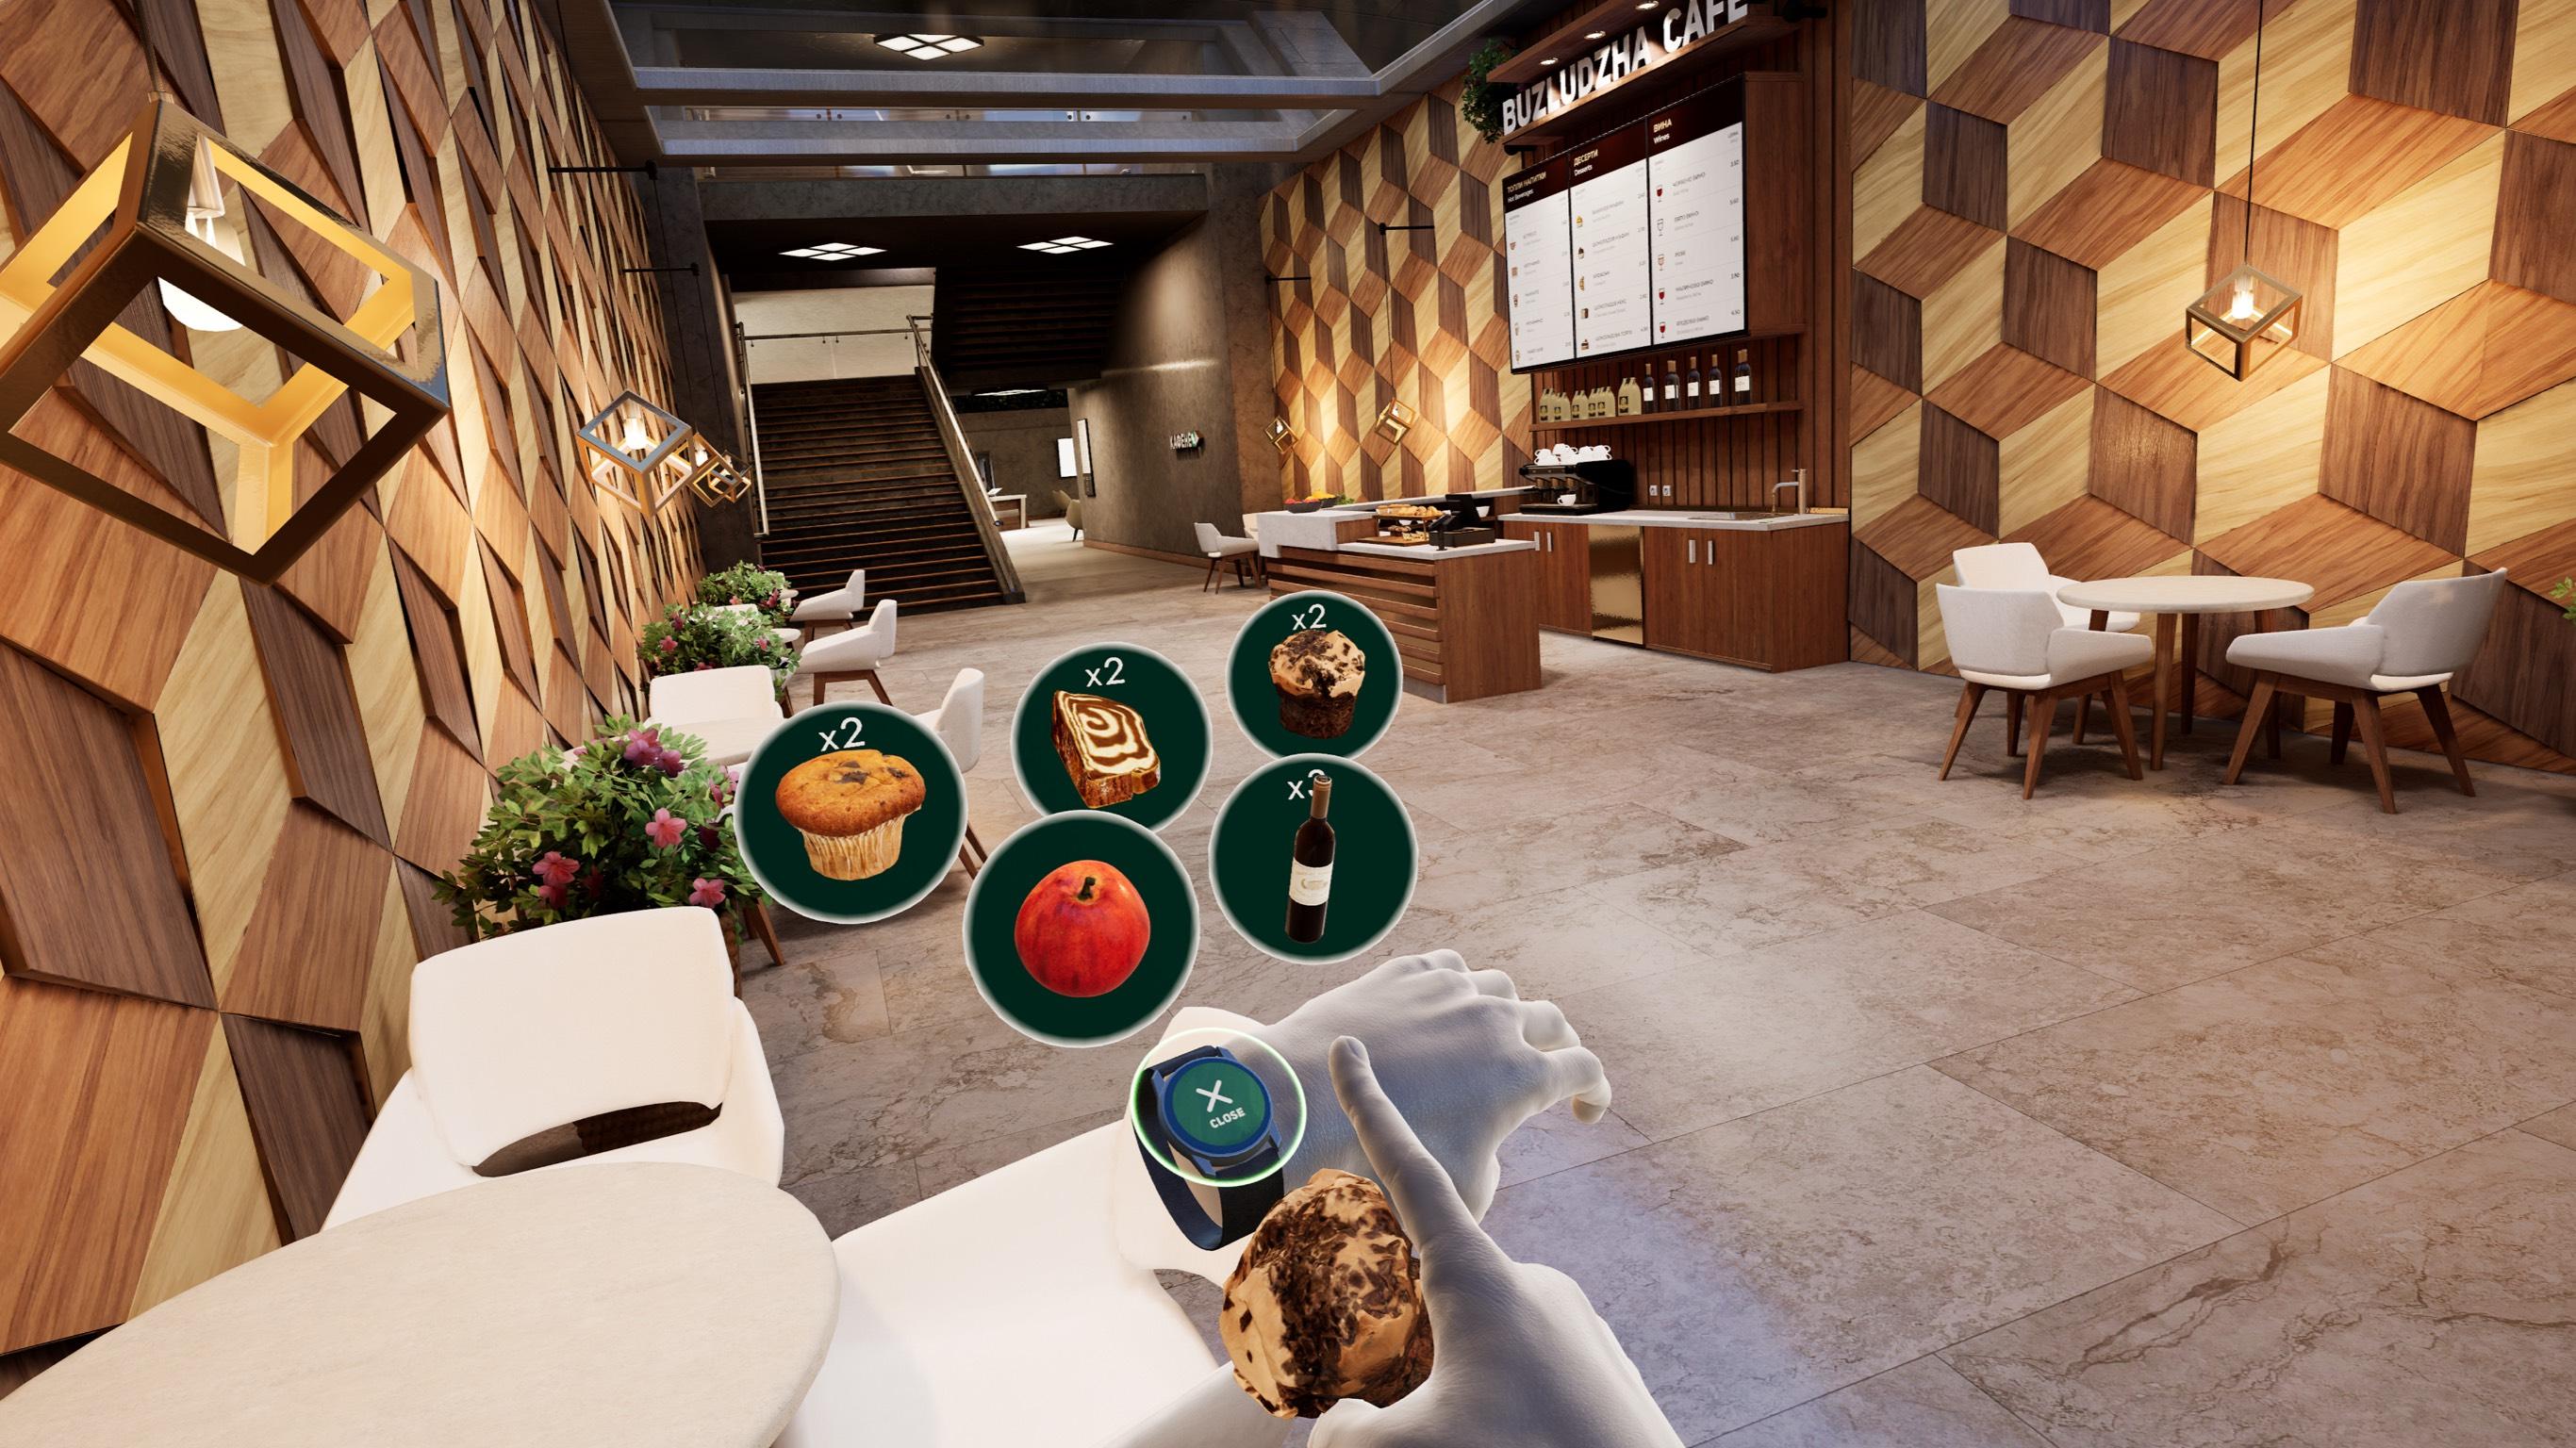 Buzludzha VR Cafe